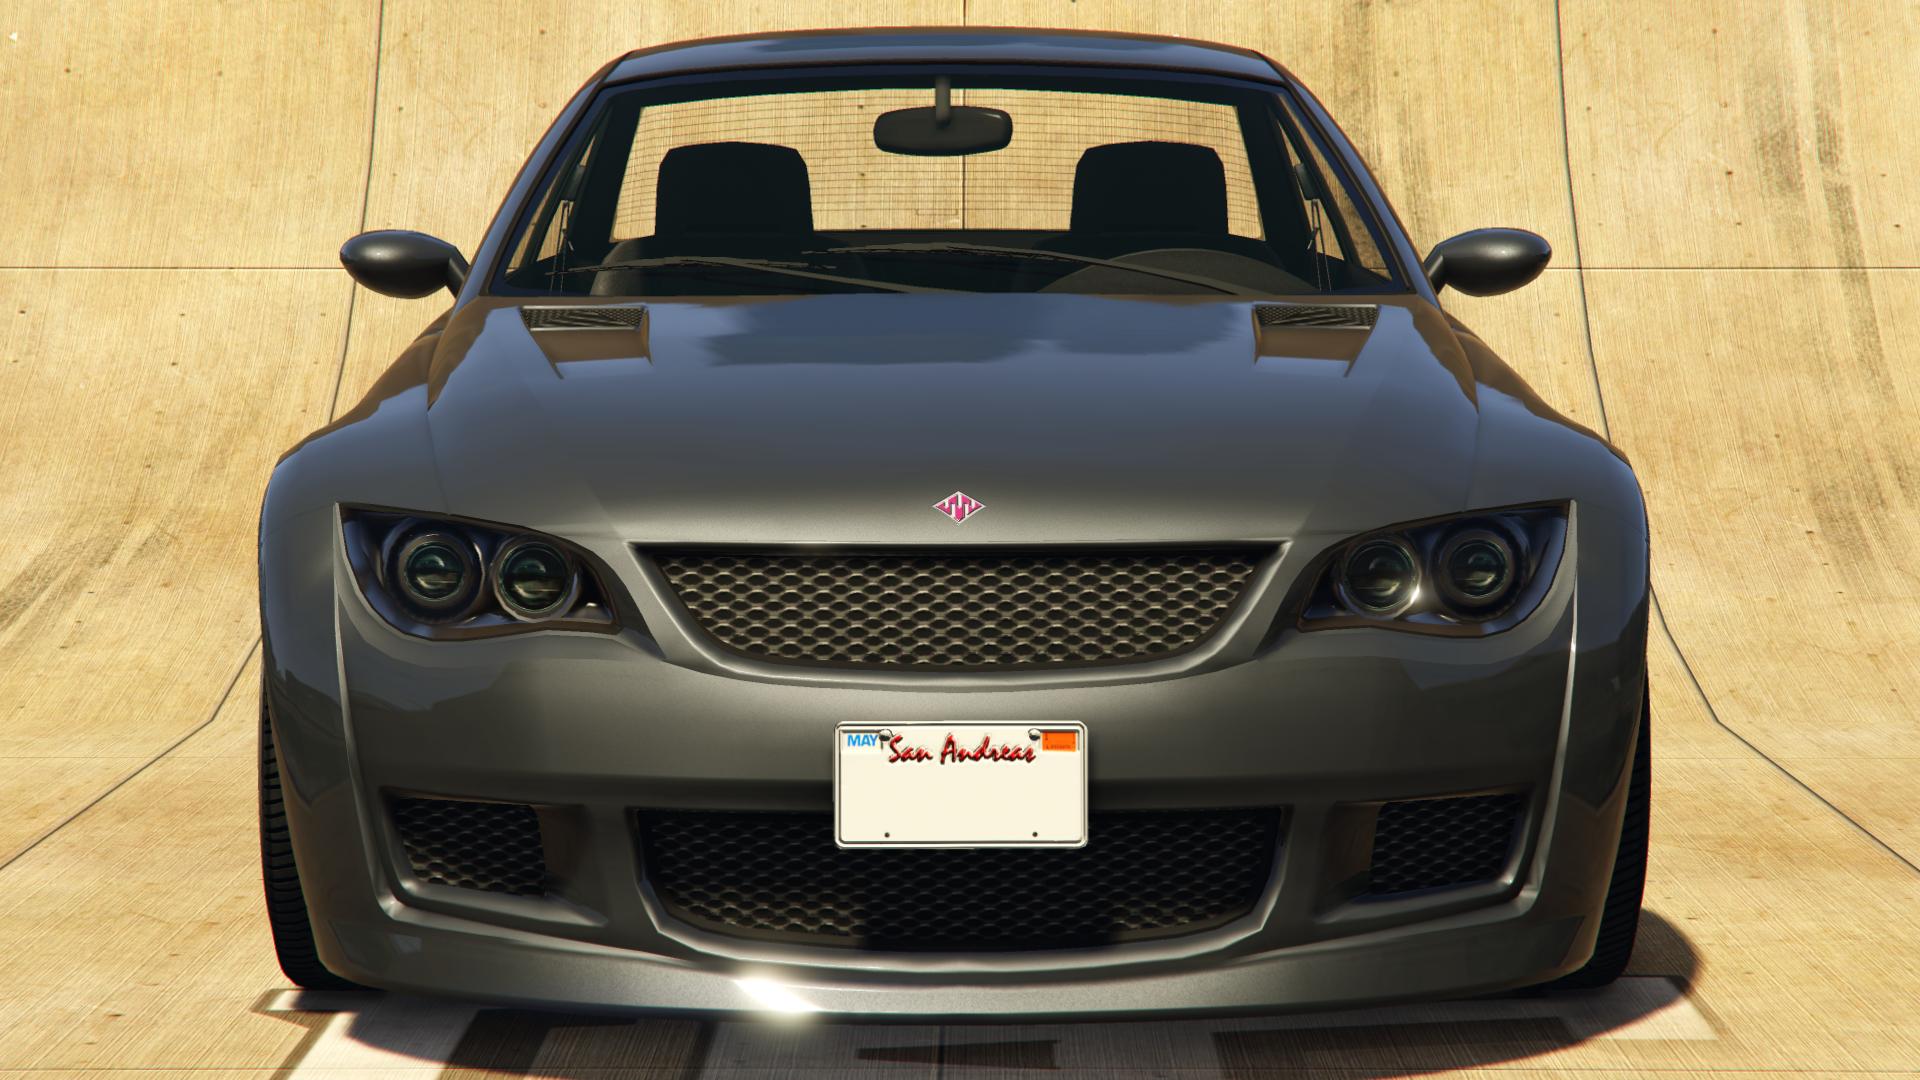 Discussion - GTA:O Mega Car Location Thread! | Se7enSins Gaming